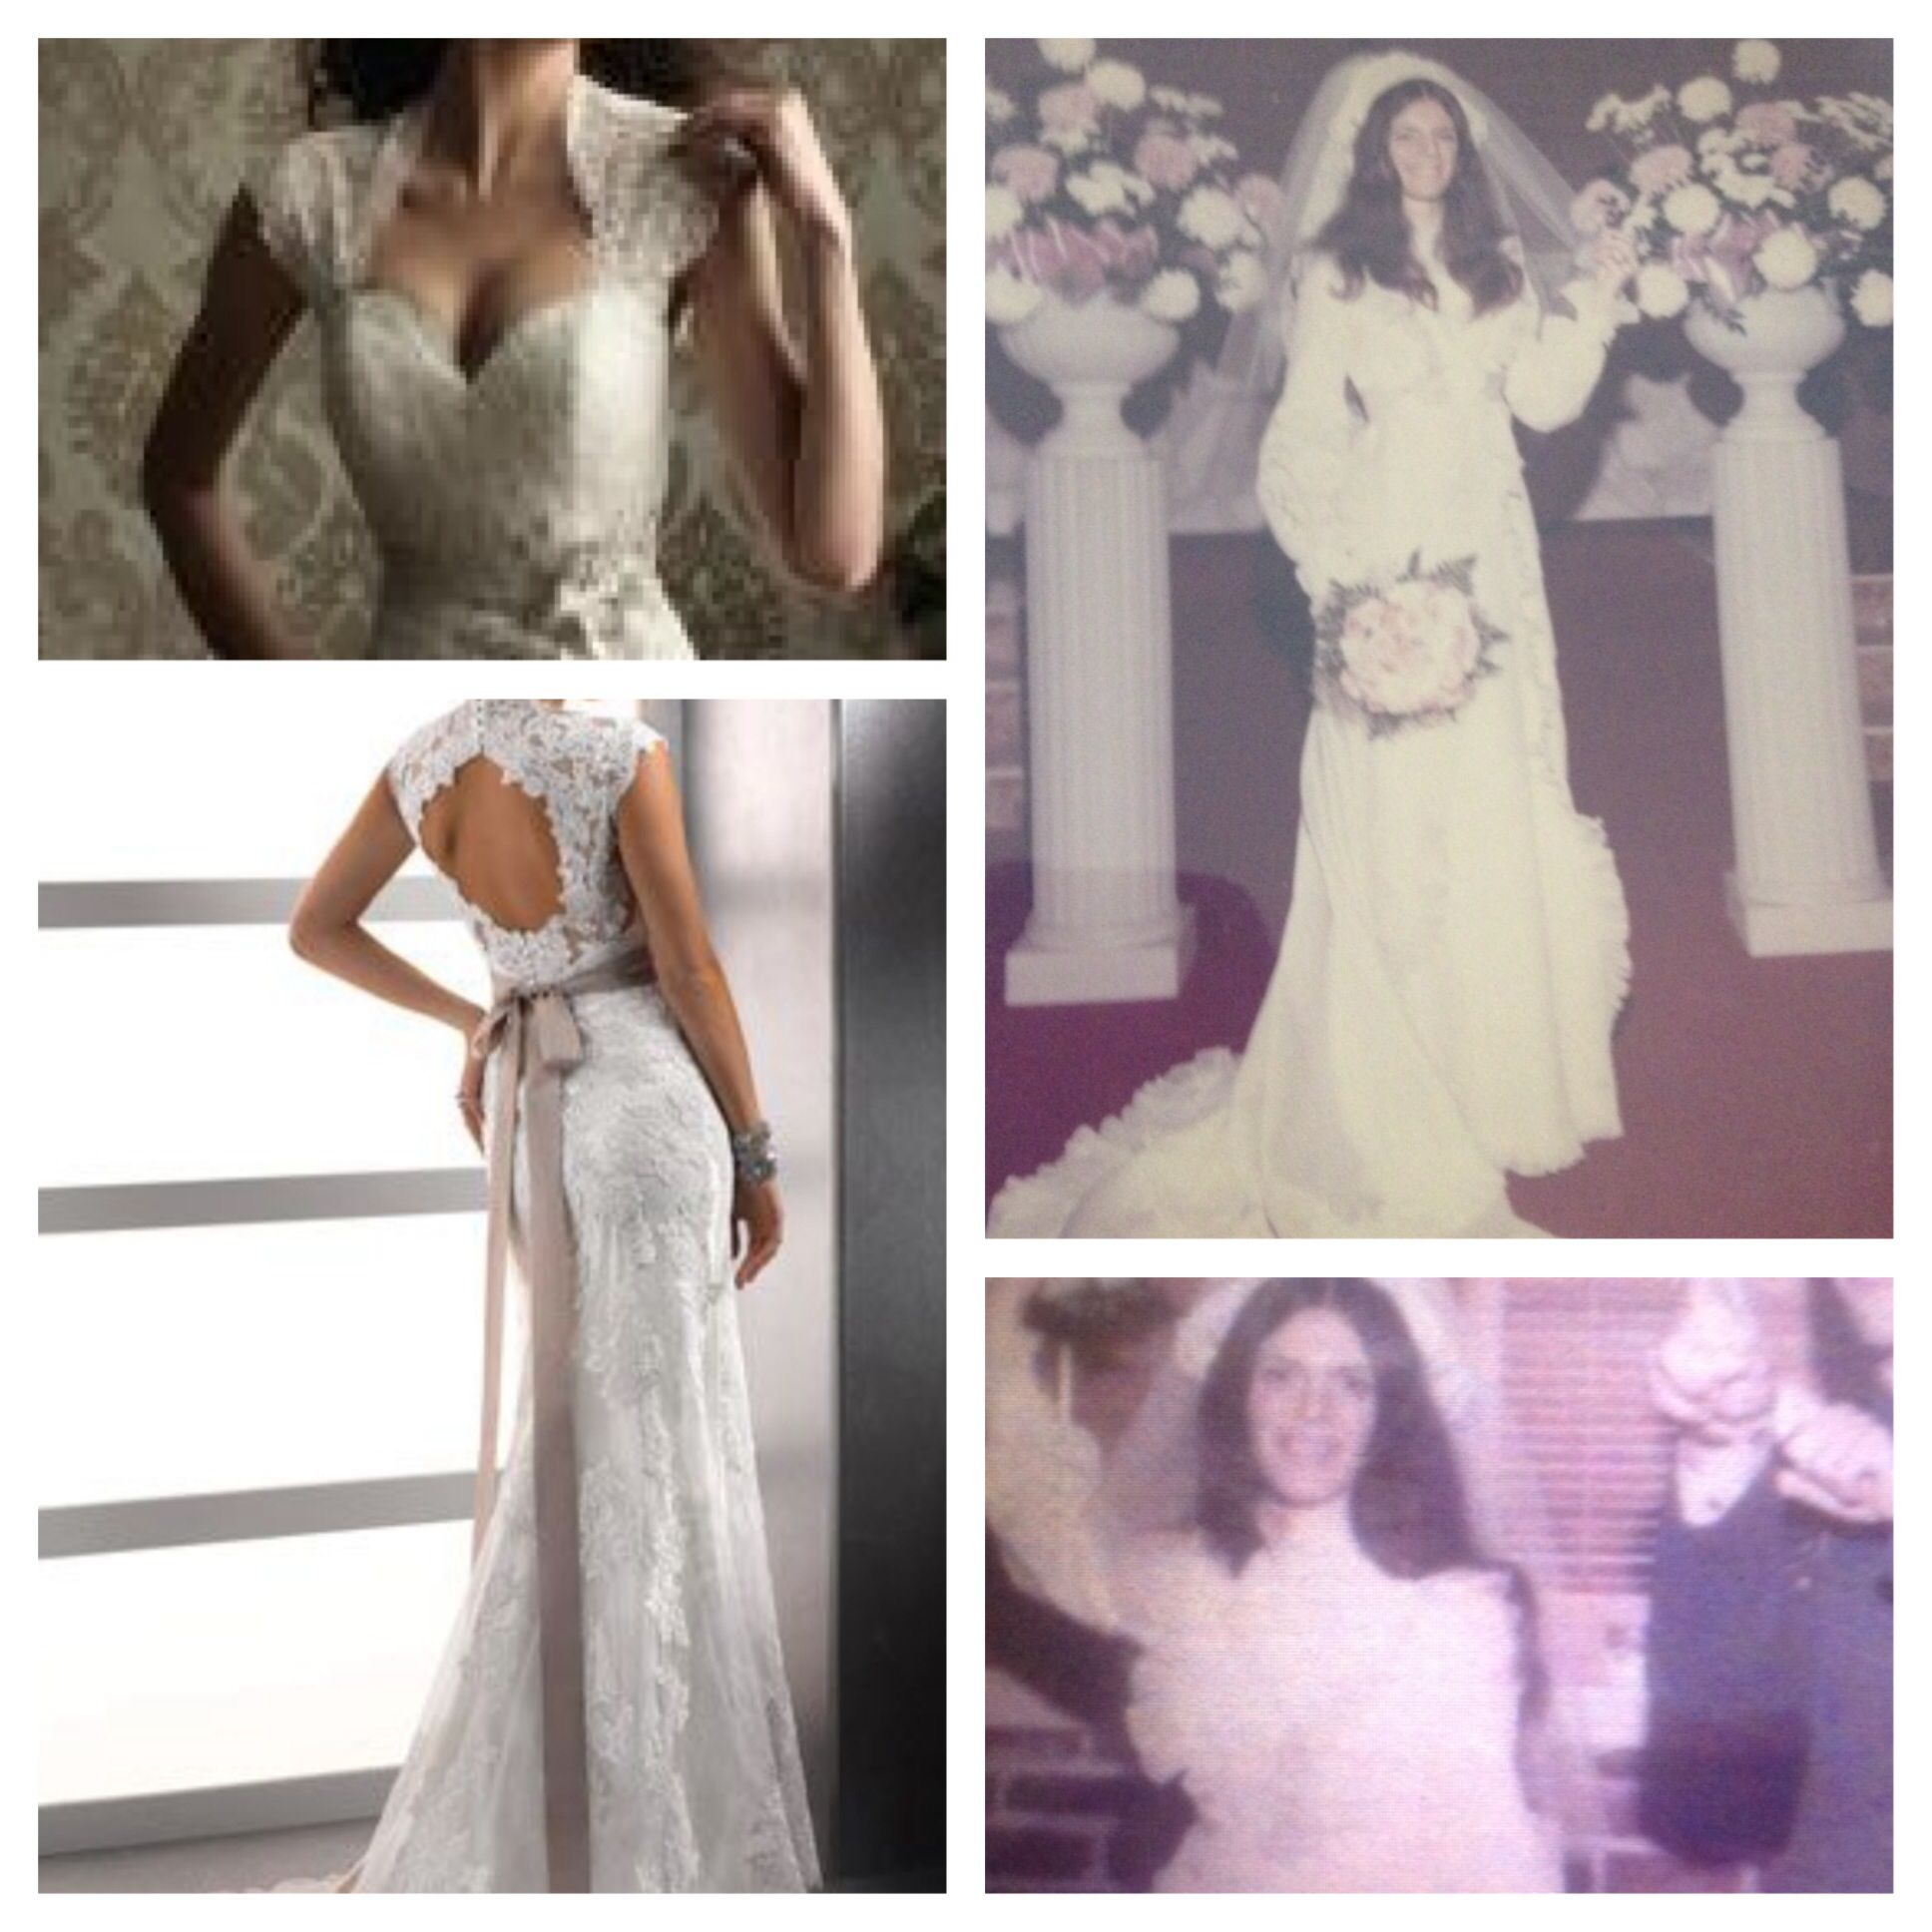 Diy Wedding Gowns: Reusing My Mother's Wedding Dress In 2019